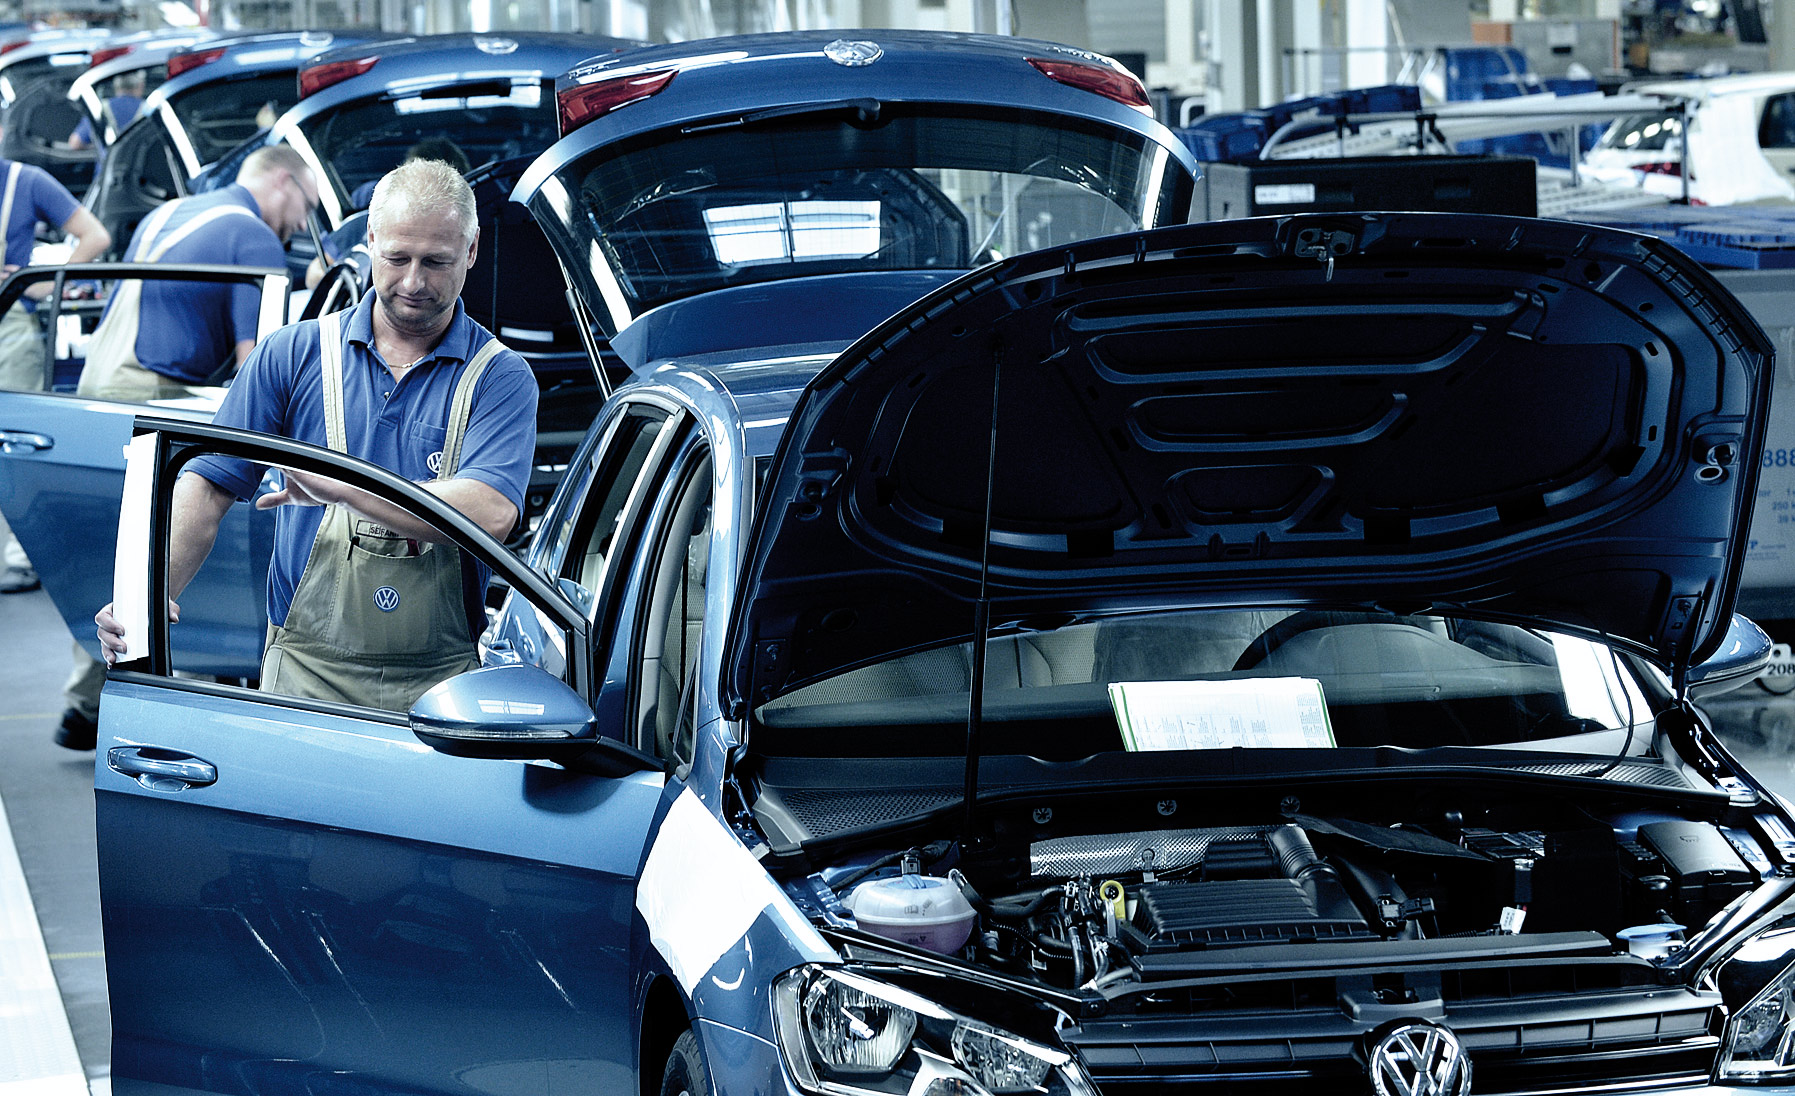 VW Credit, Inc. Closes US $9 Billion Credit Facility With Consortium